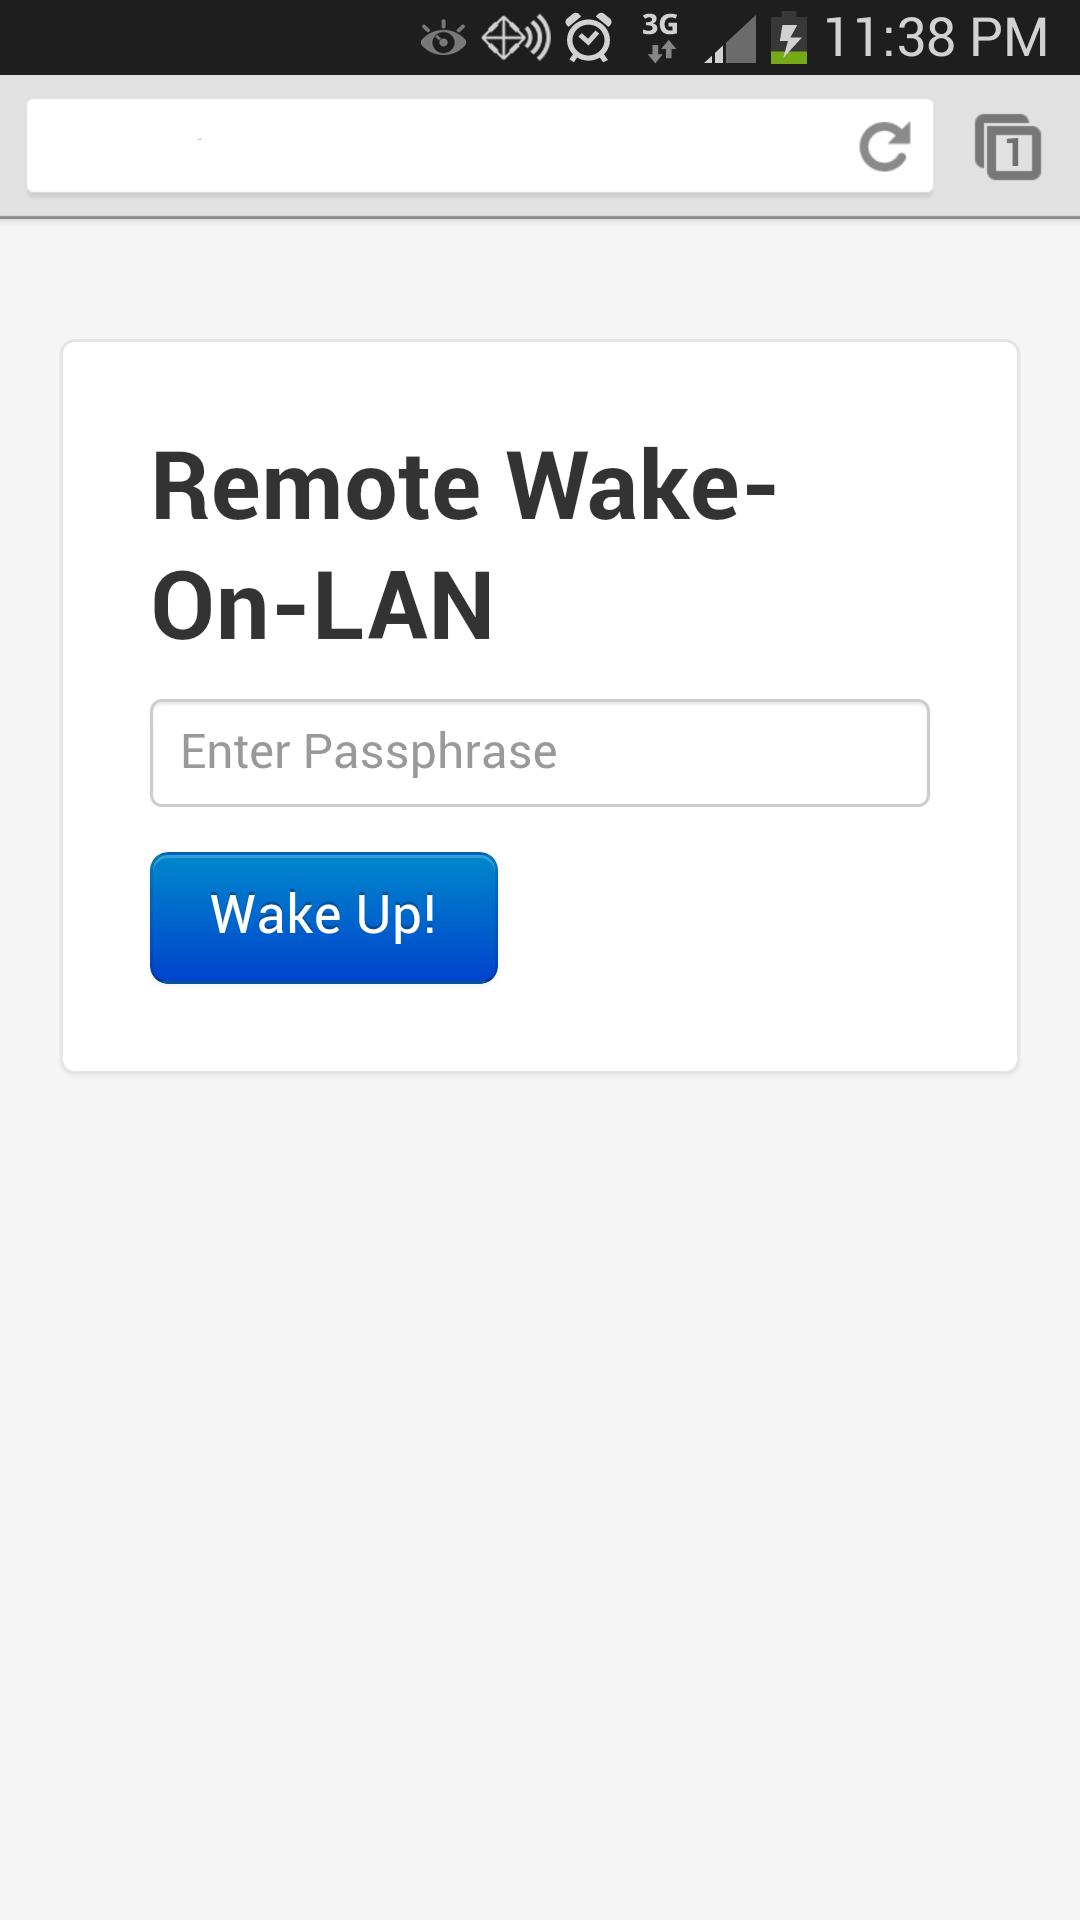 how to use wake woke woken